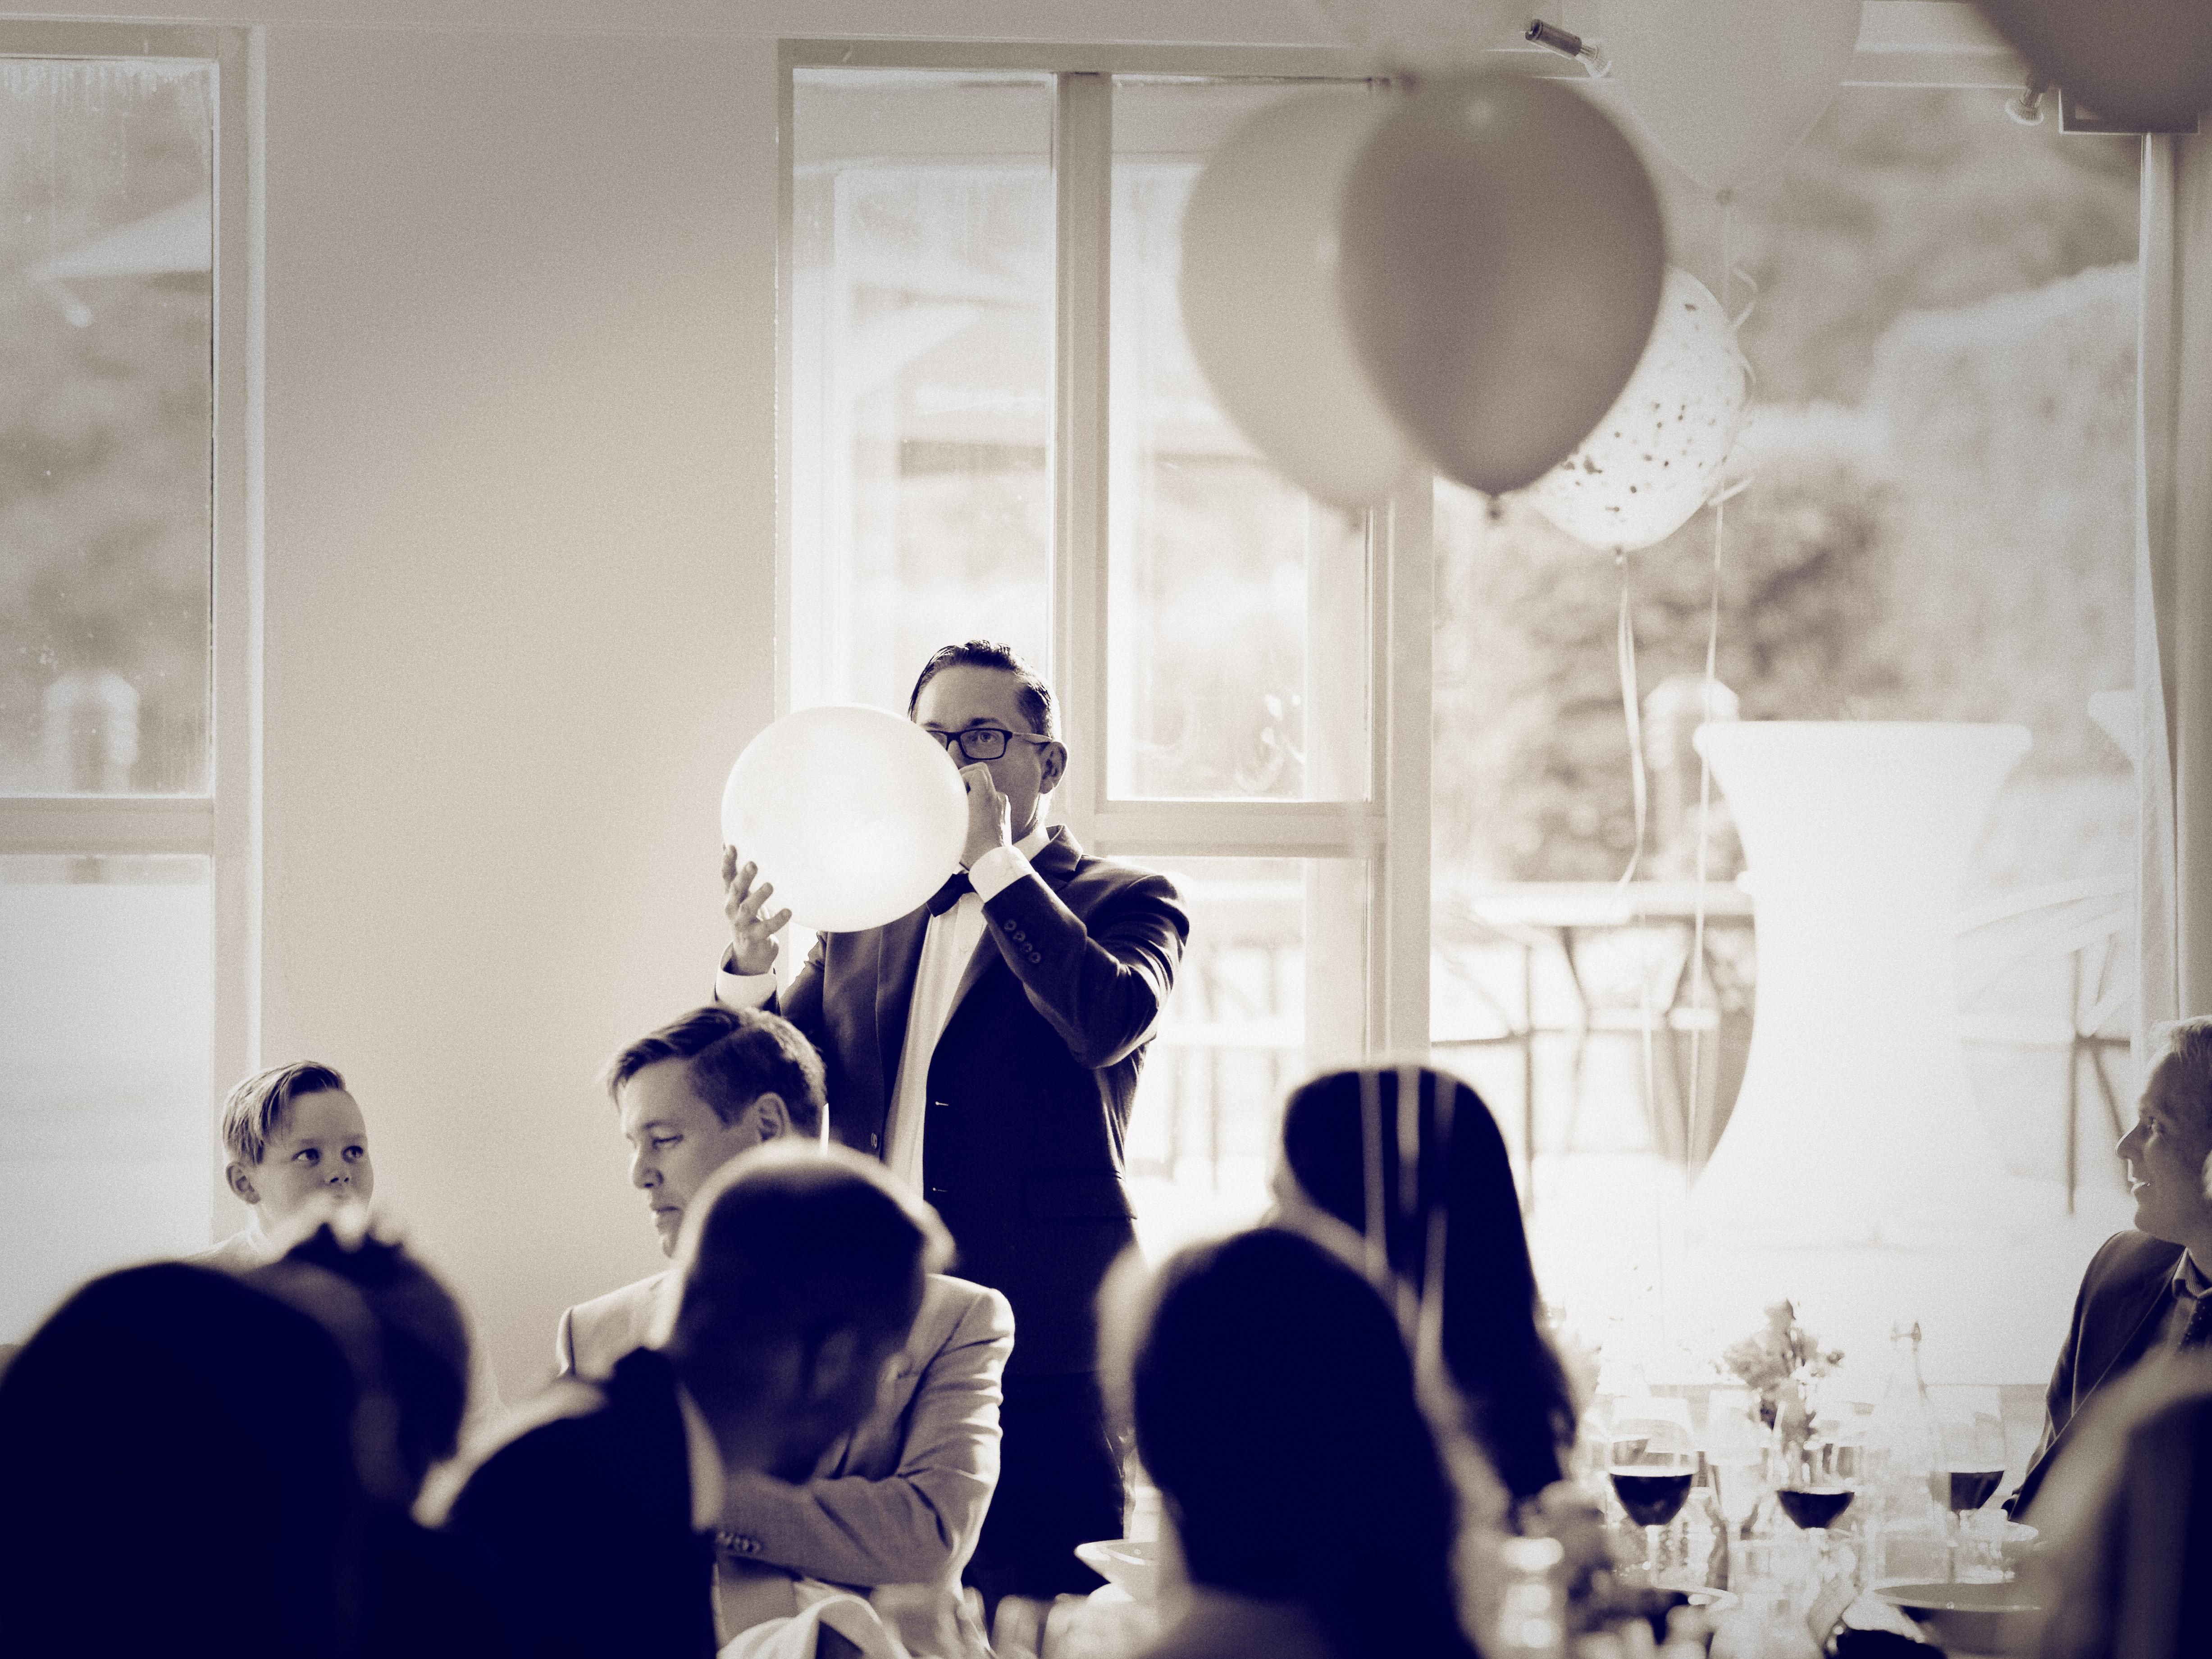 Brudens bror med heliumballong